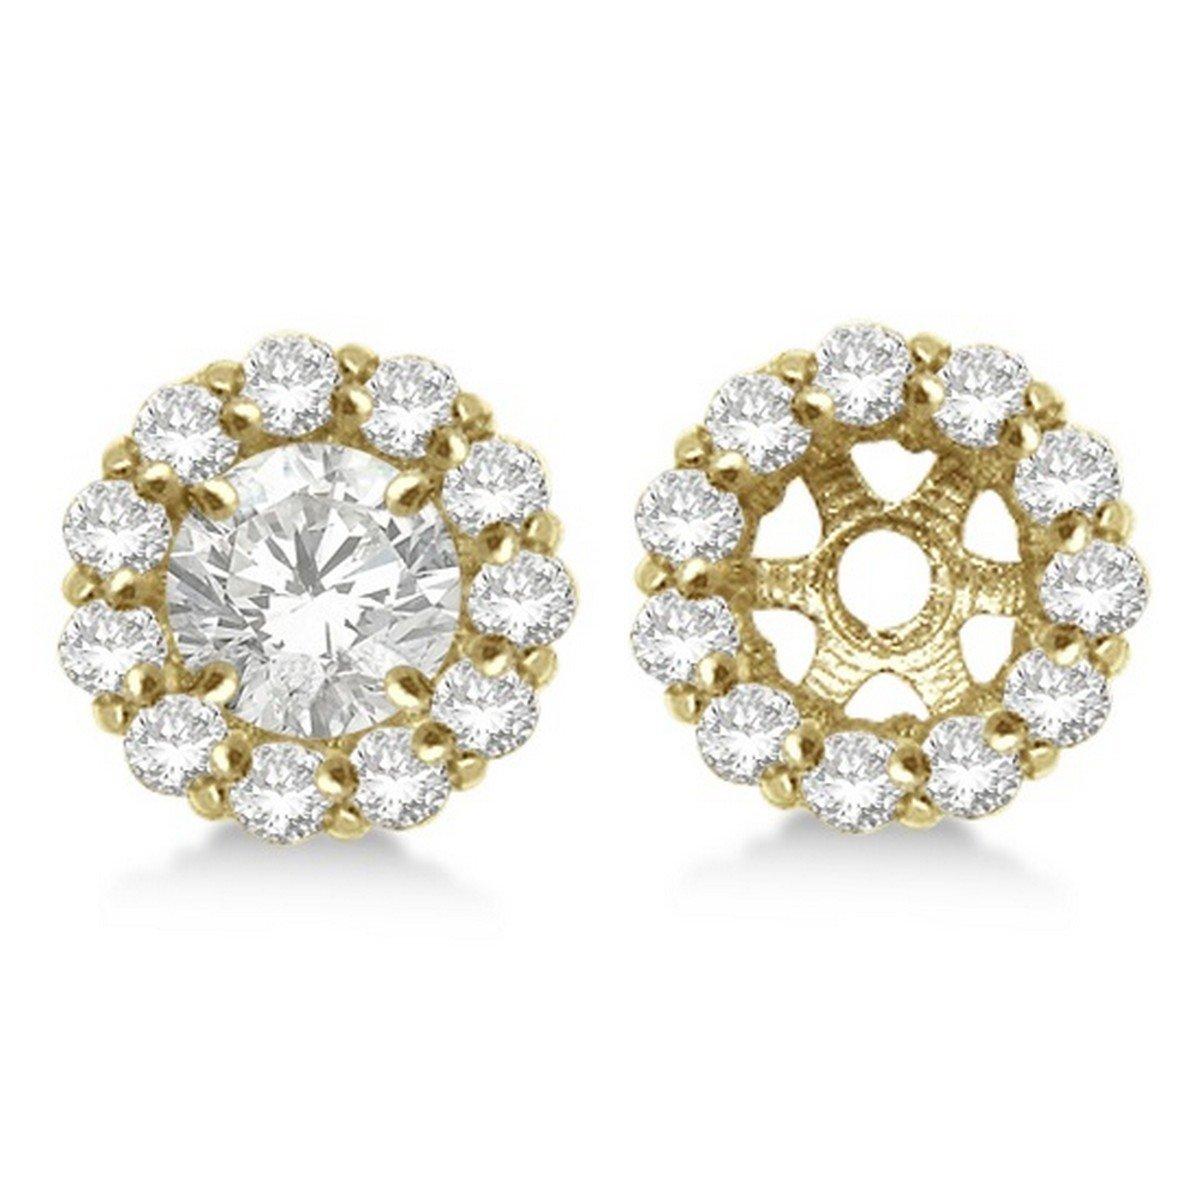 Round Diamond Earring Jackets for 8mm Diamond Studs 14K Yellow Gold 1.00ct